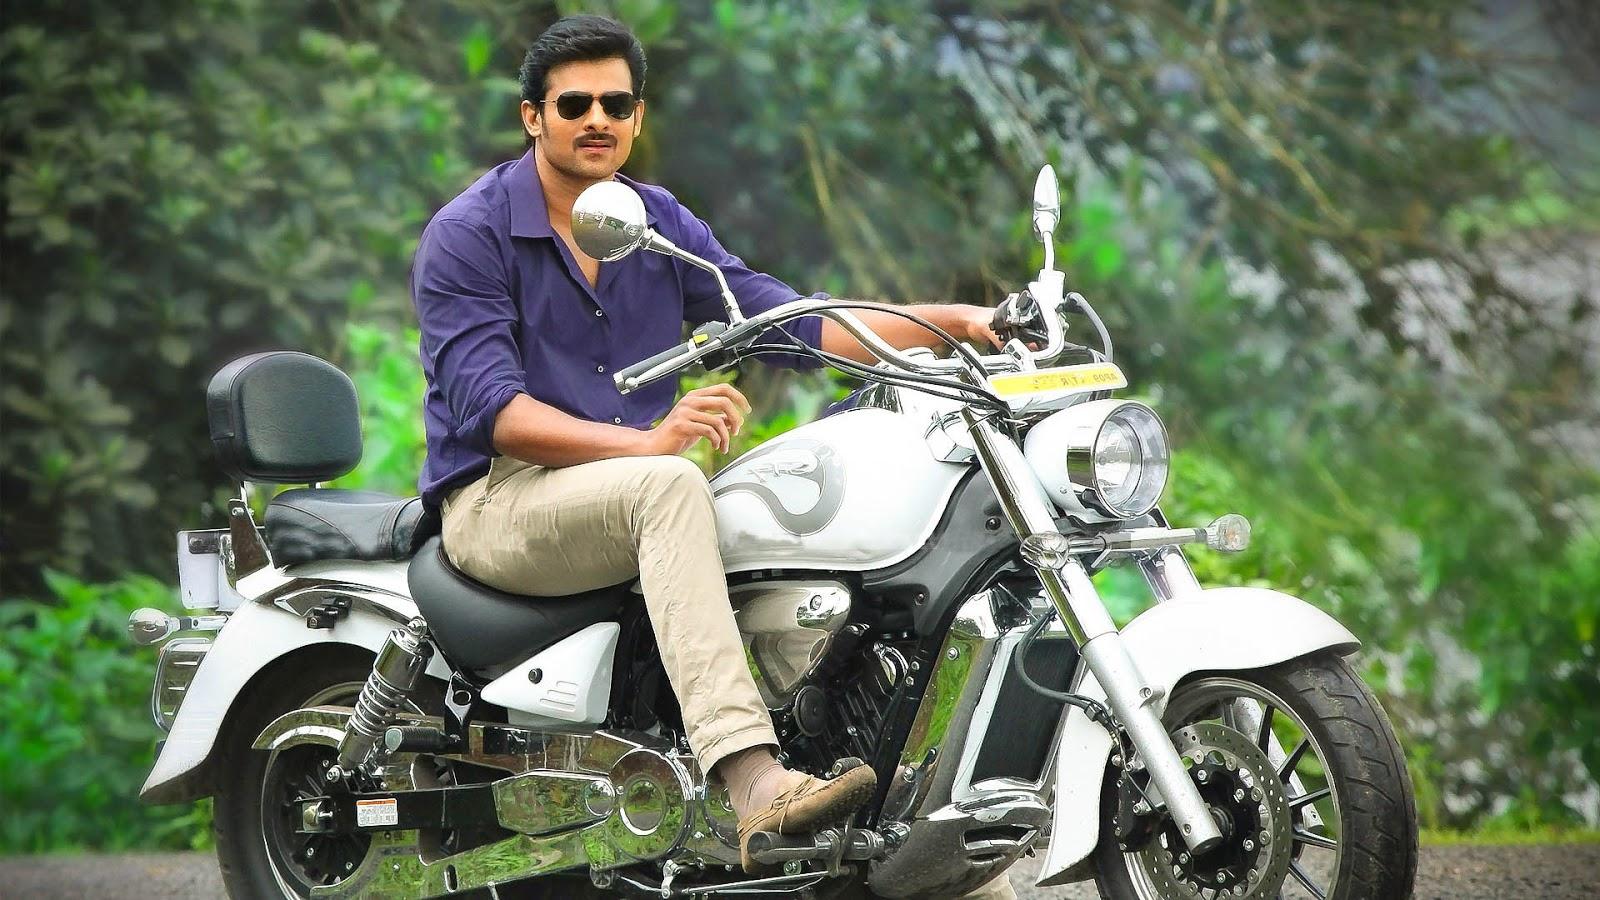 Best Actor Prabhas Hd Wallpaper: Prabhas Latest Hd Photos